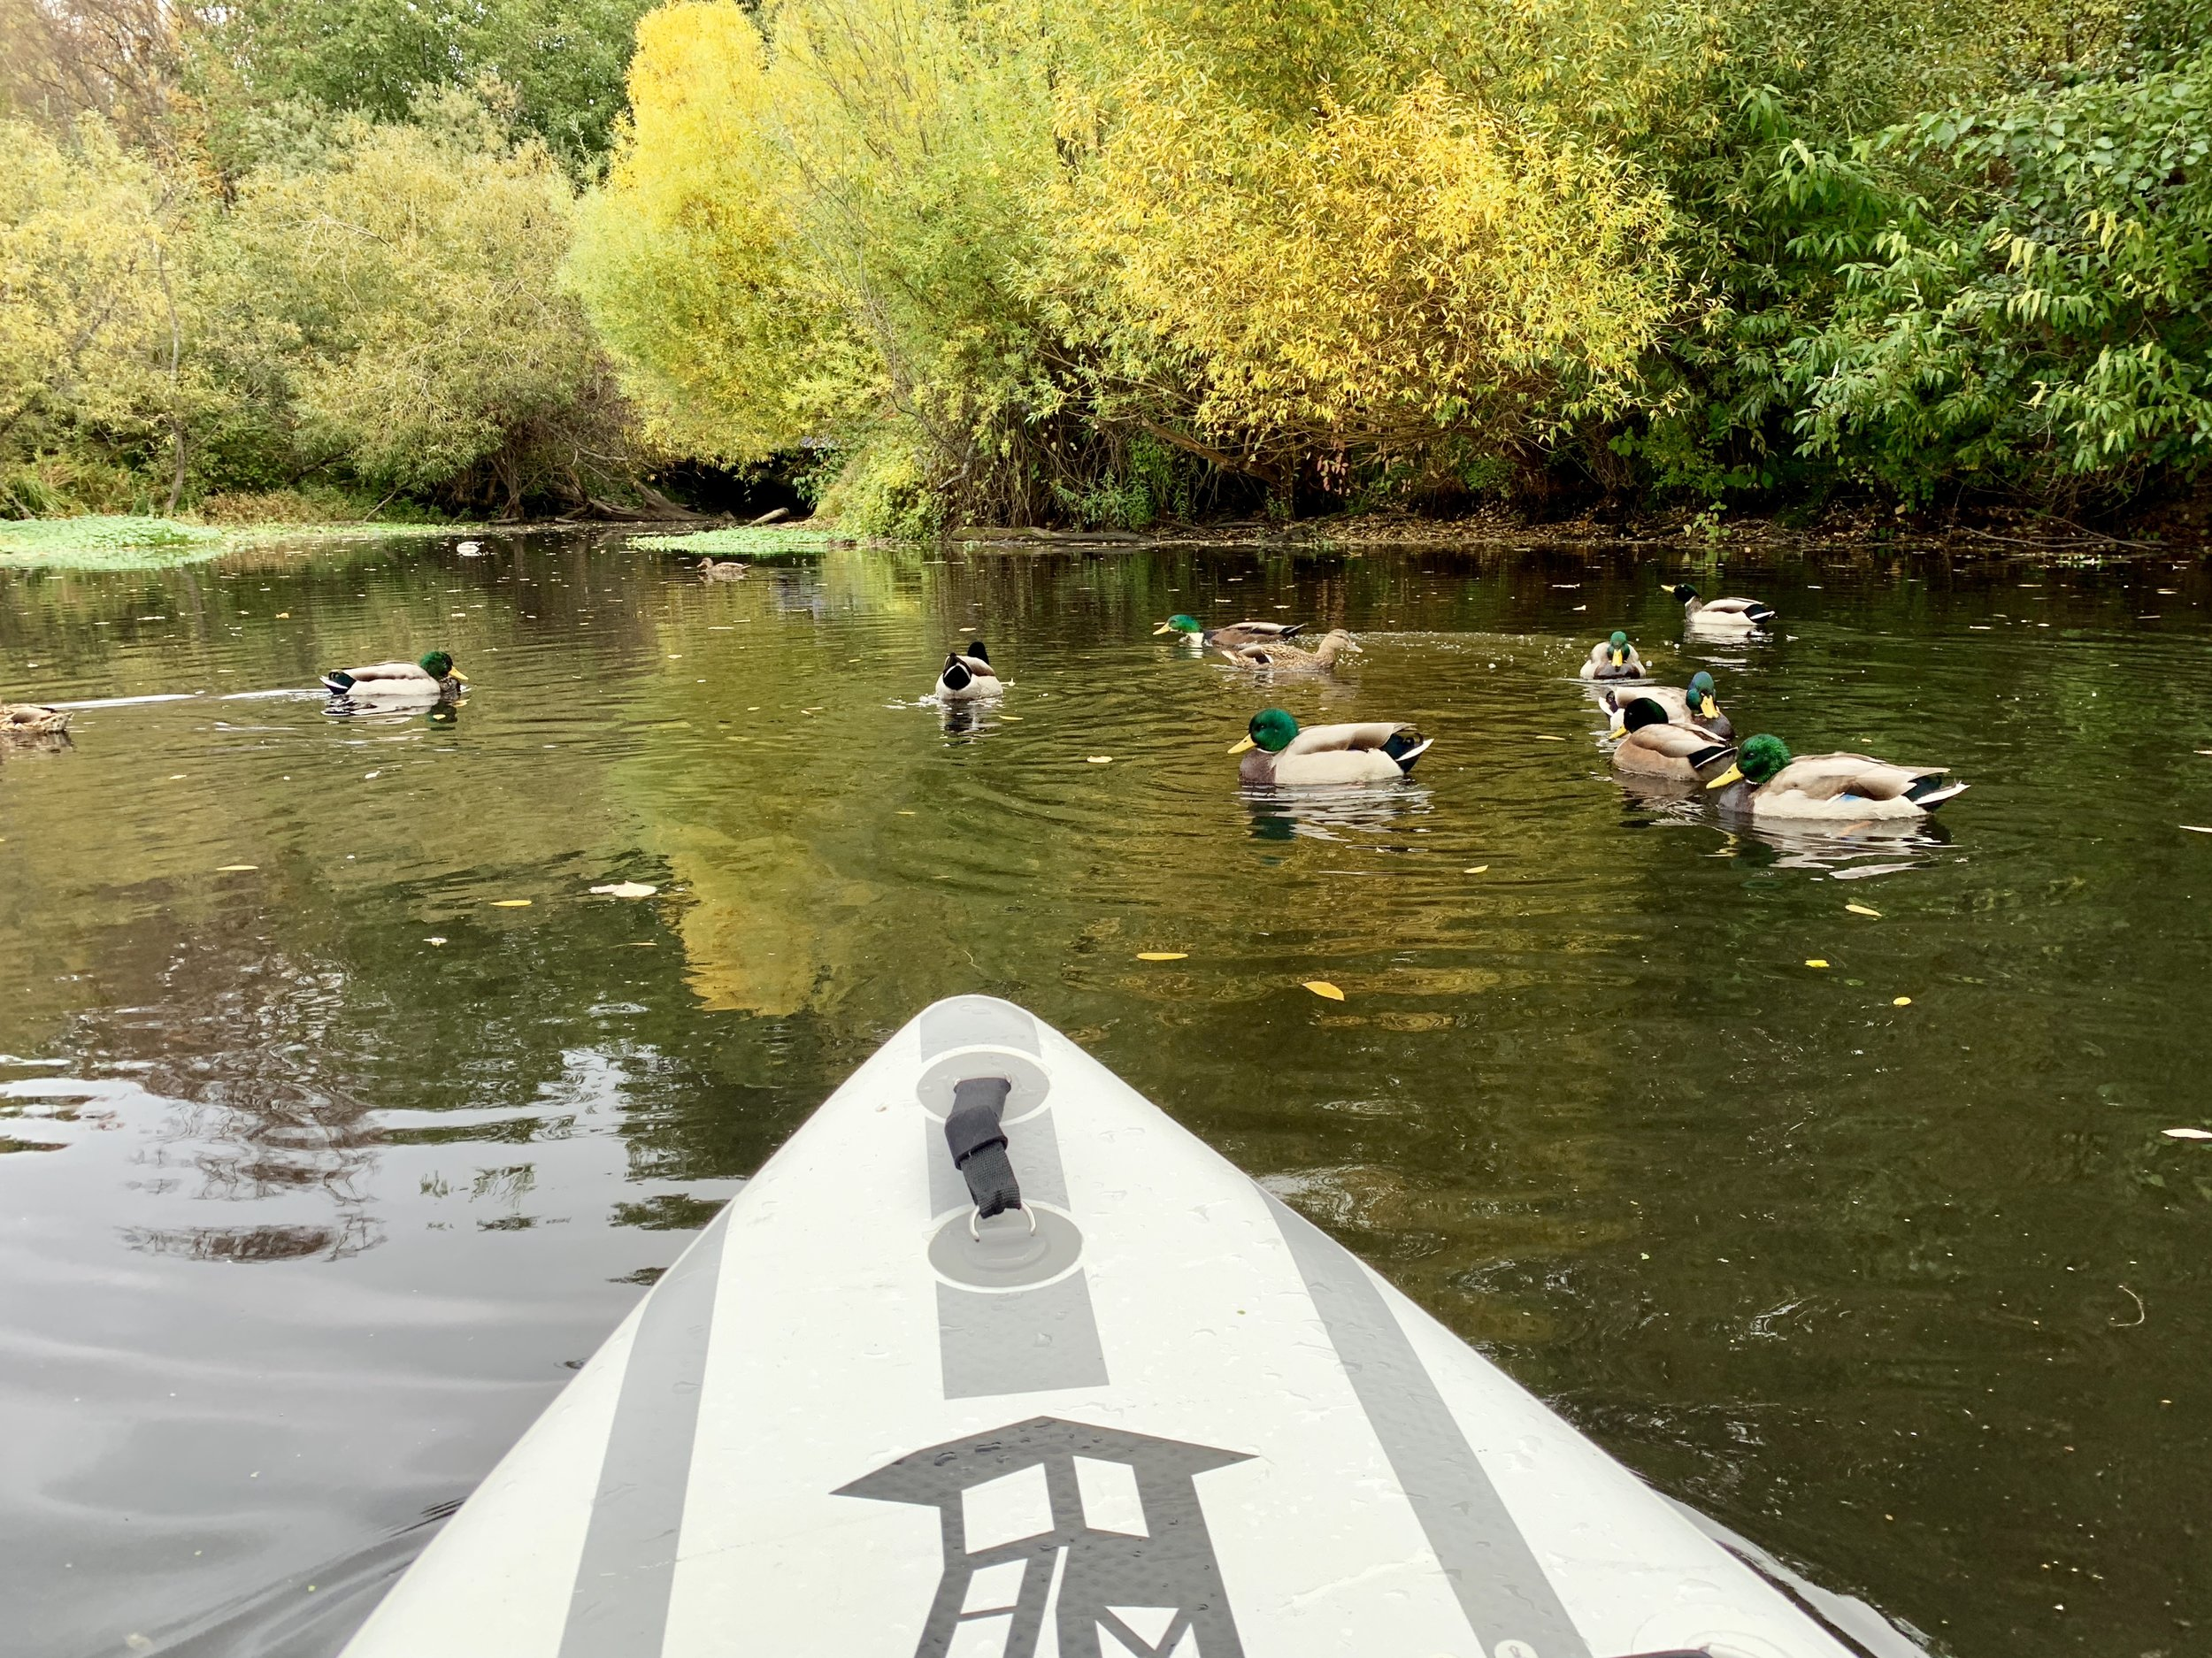 Paddling in Duck Bay at the Washington Park Arboretum